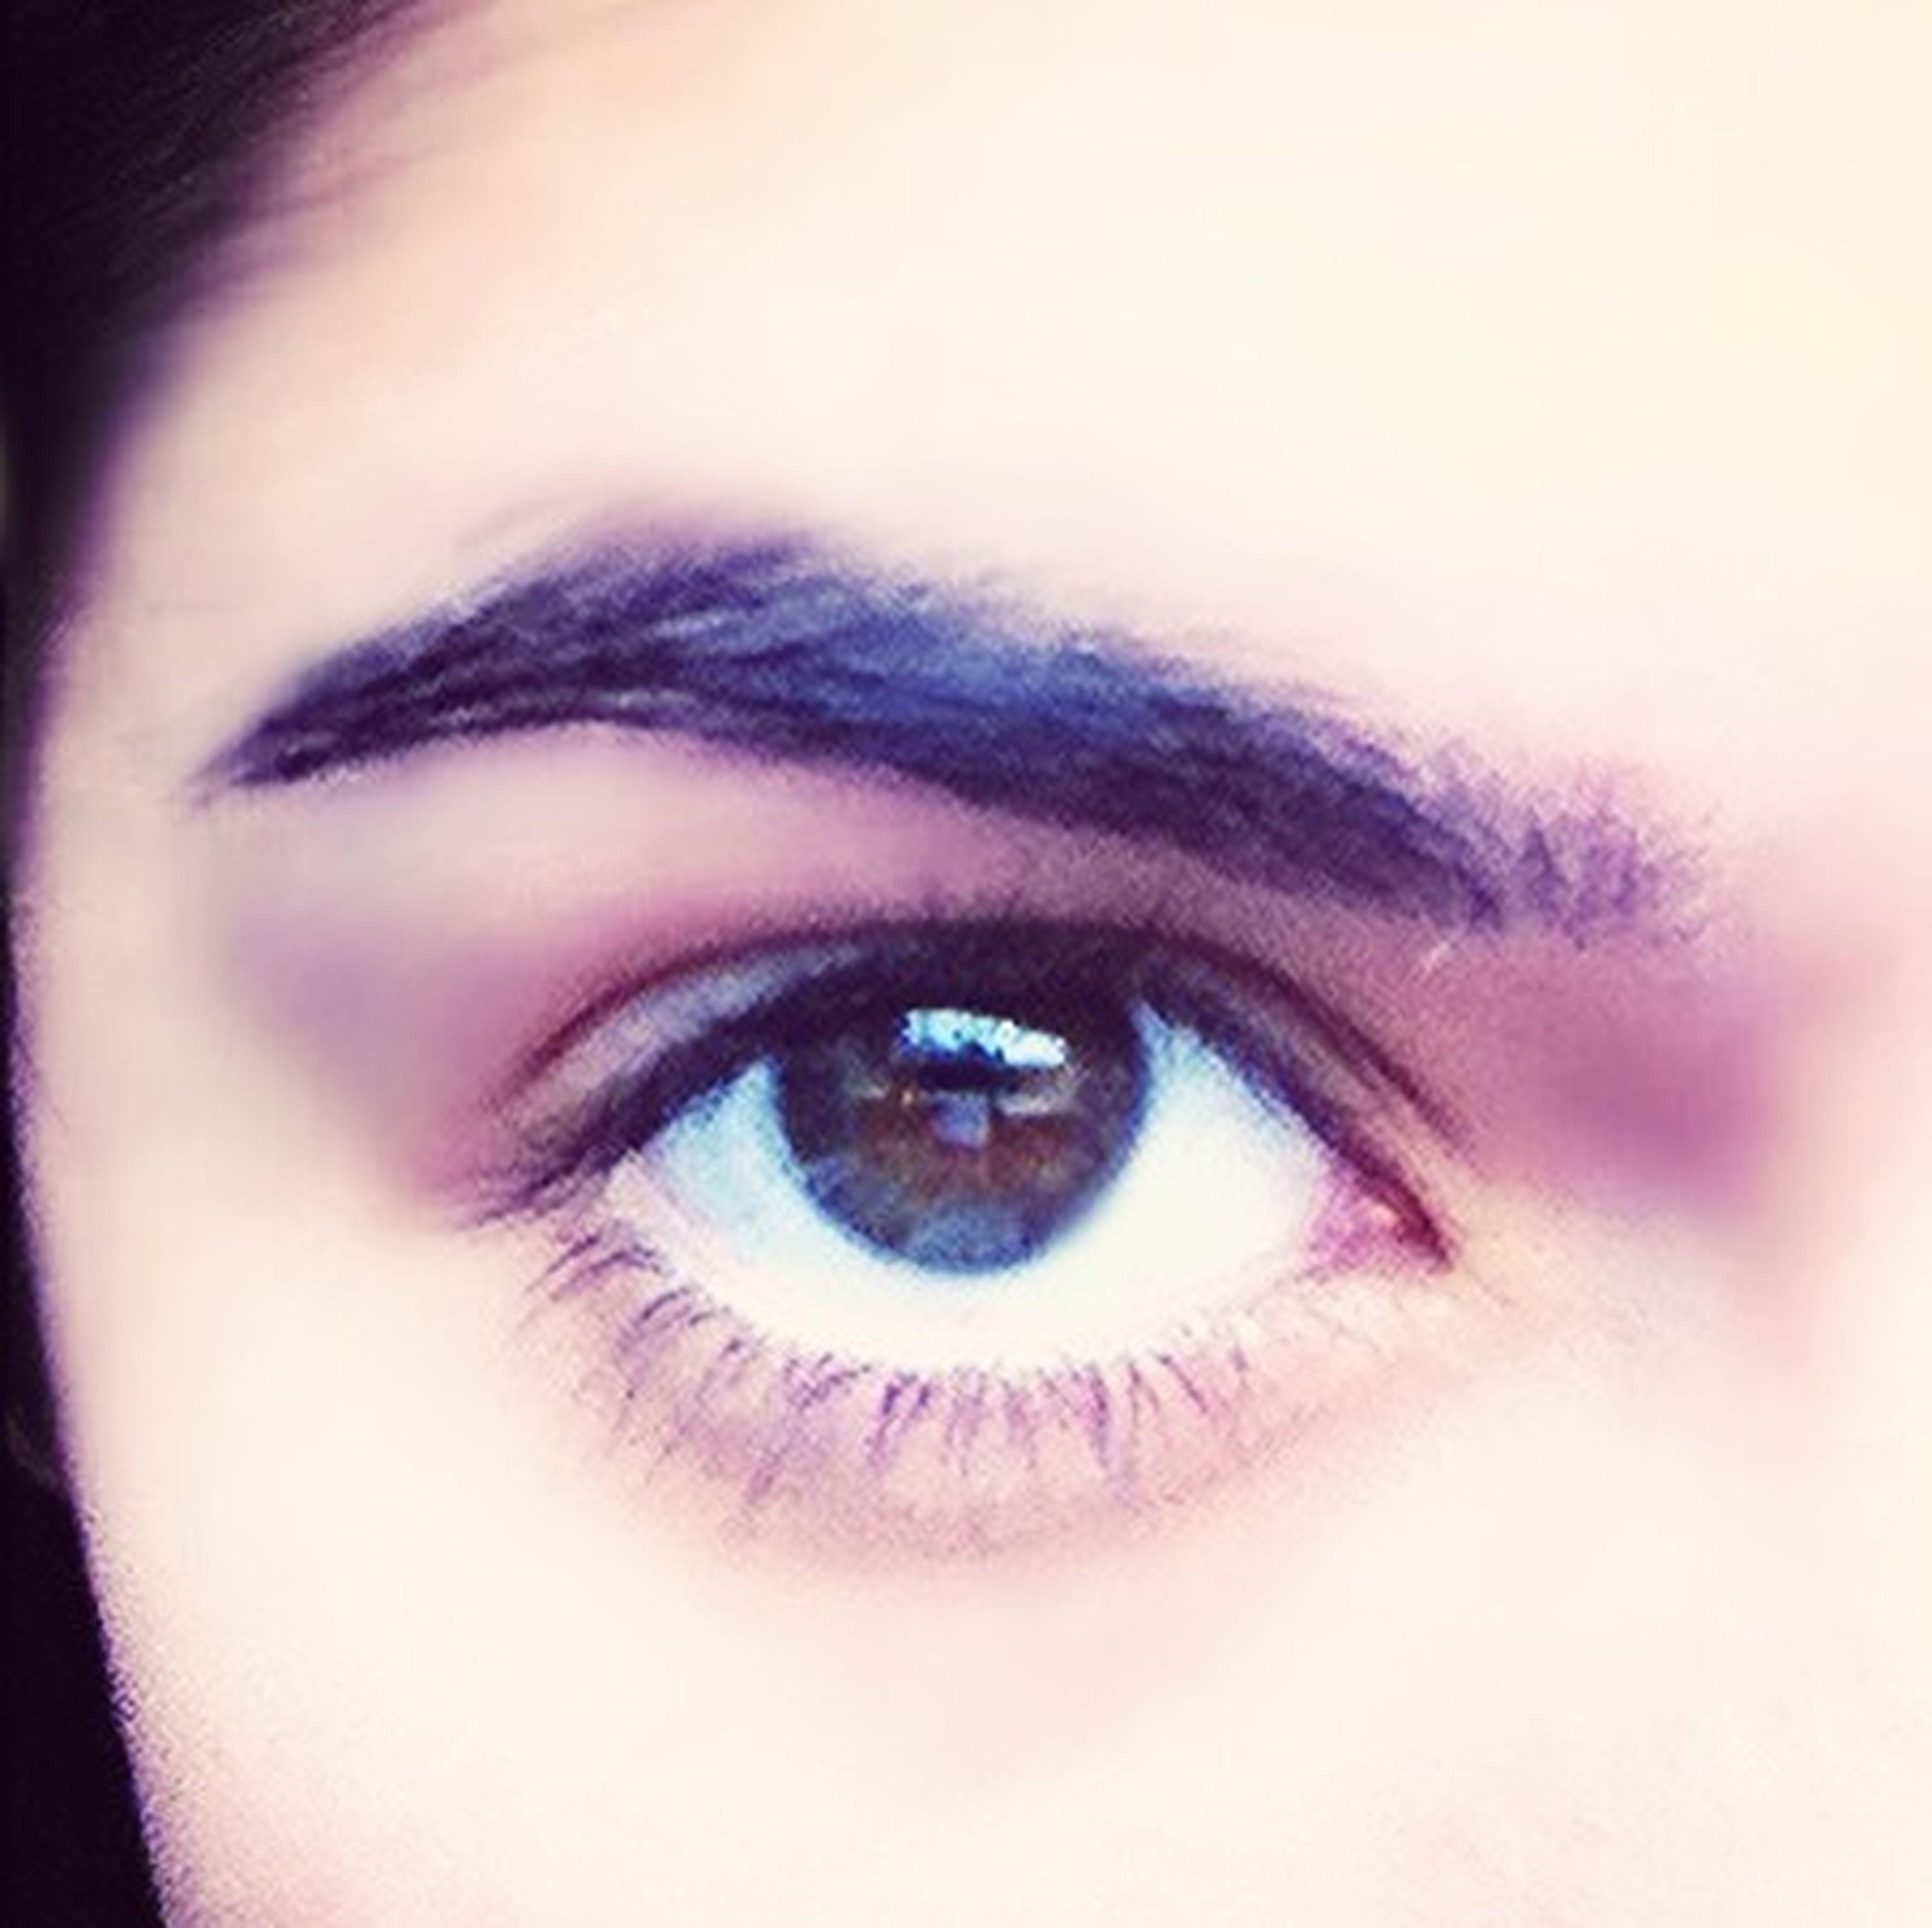 human eye, looking at camera, portrait, close-up, eyelash, human face, headshot, eyesight, lifestyles, young adult, sensory perception, indoors, front view, auto post production filter, eyebrow, human skin, person